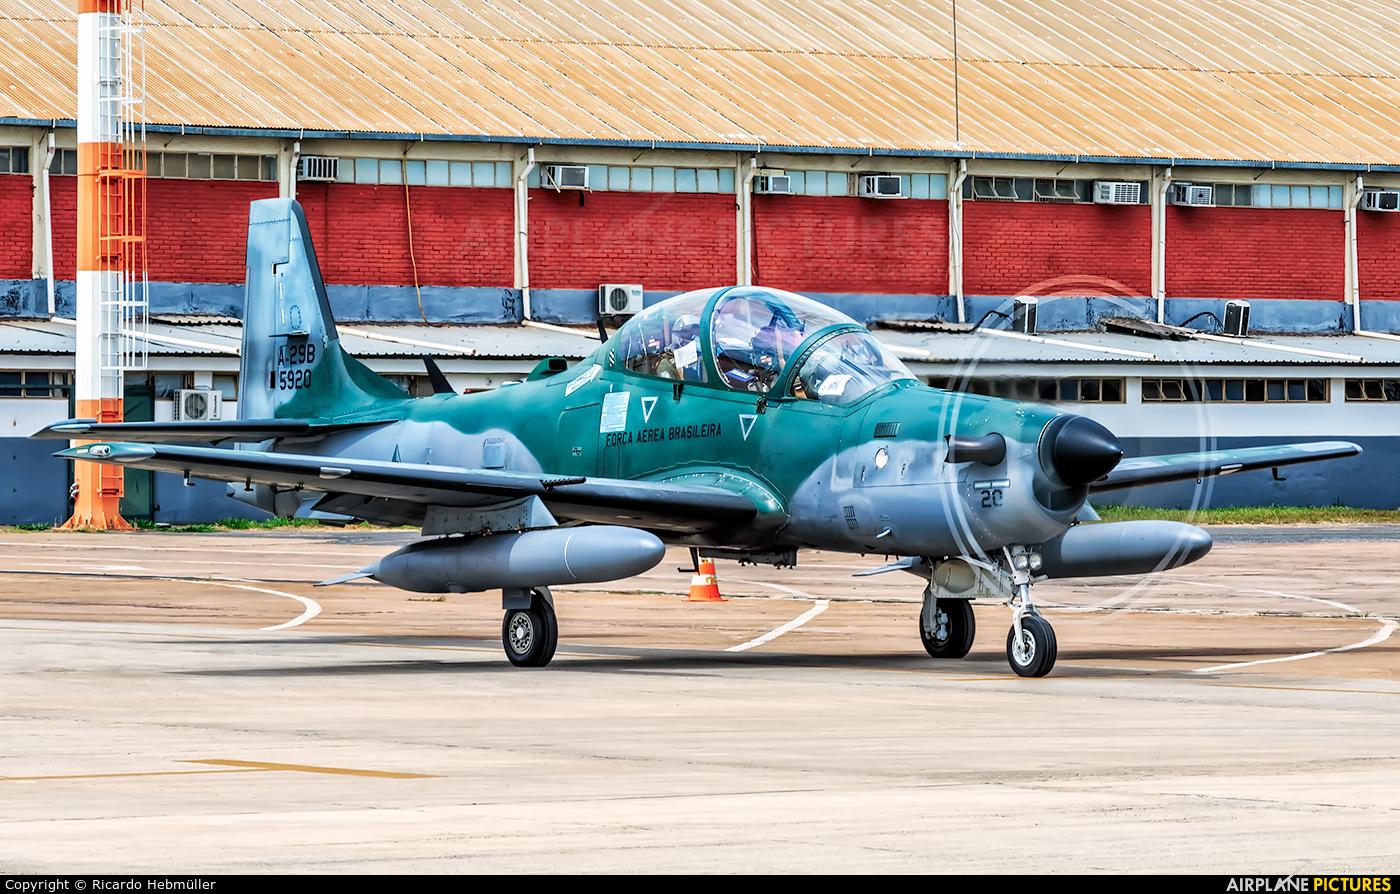 Brazil - Air Force 5920 aircraft at Brasília - Presidente Juscelino Kubitschek Intl